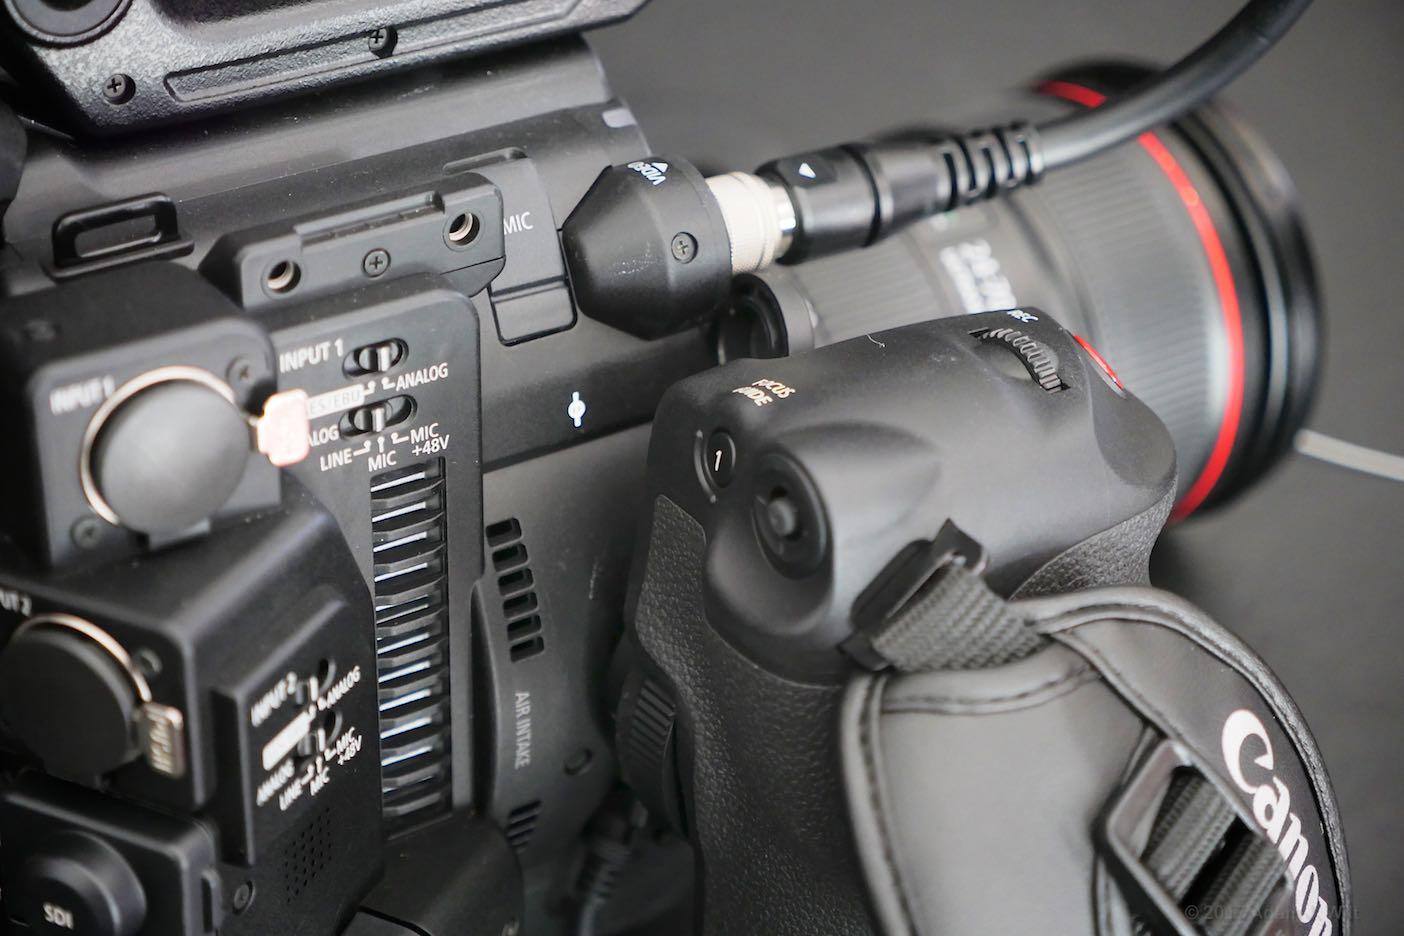 C200 side grip